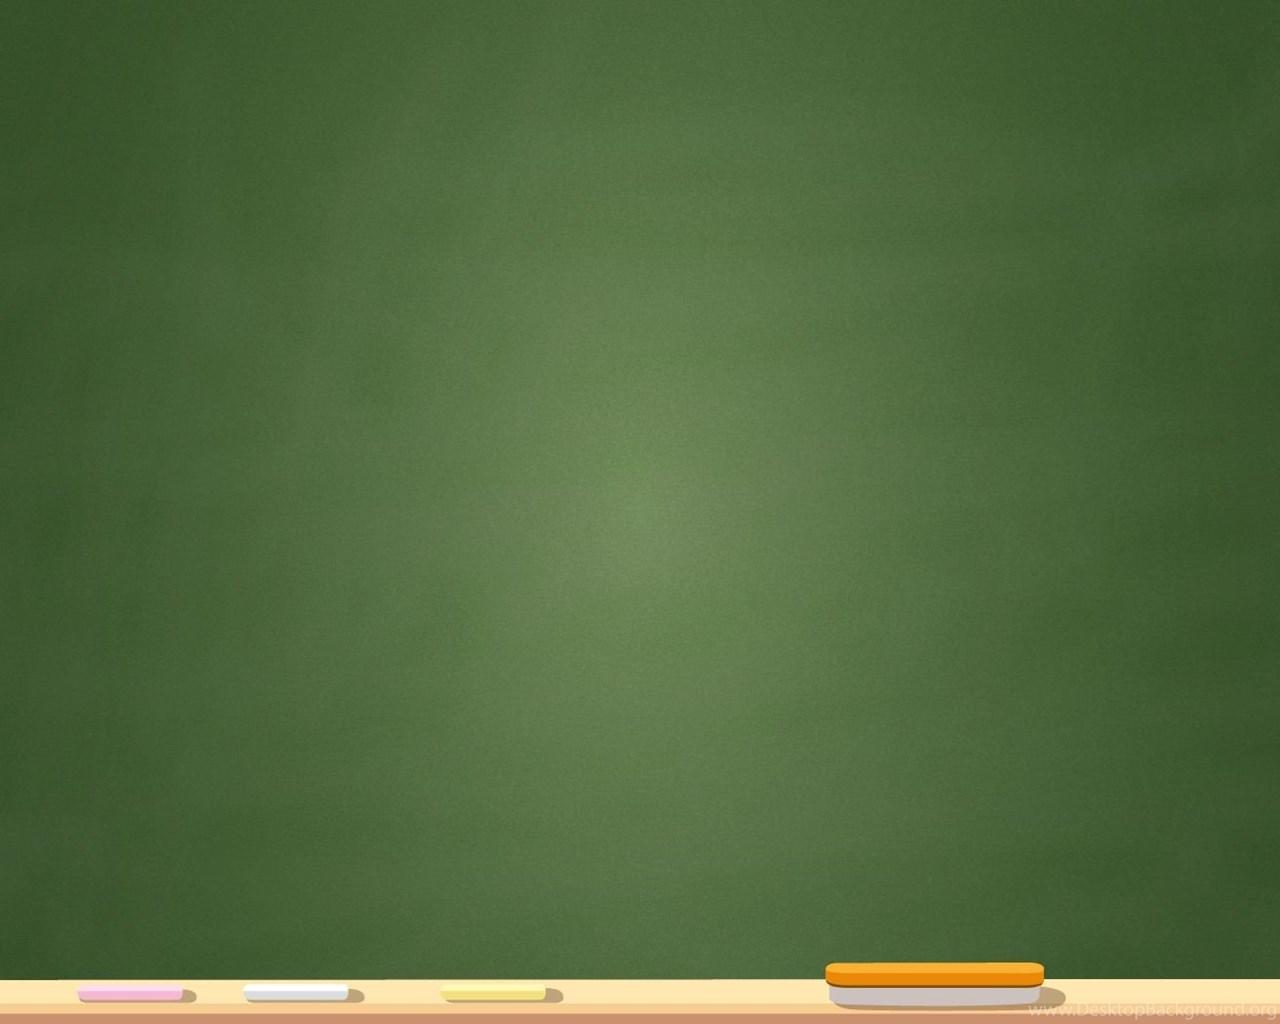 Gallery For Green Chalkboard Backgrounds Powerpoint Desktop Background